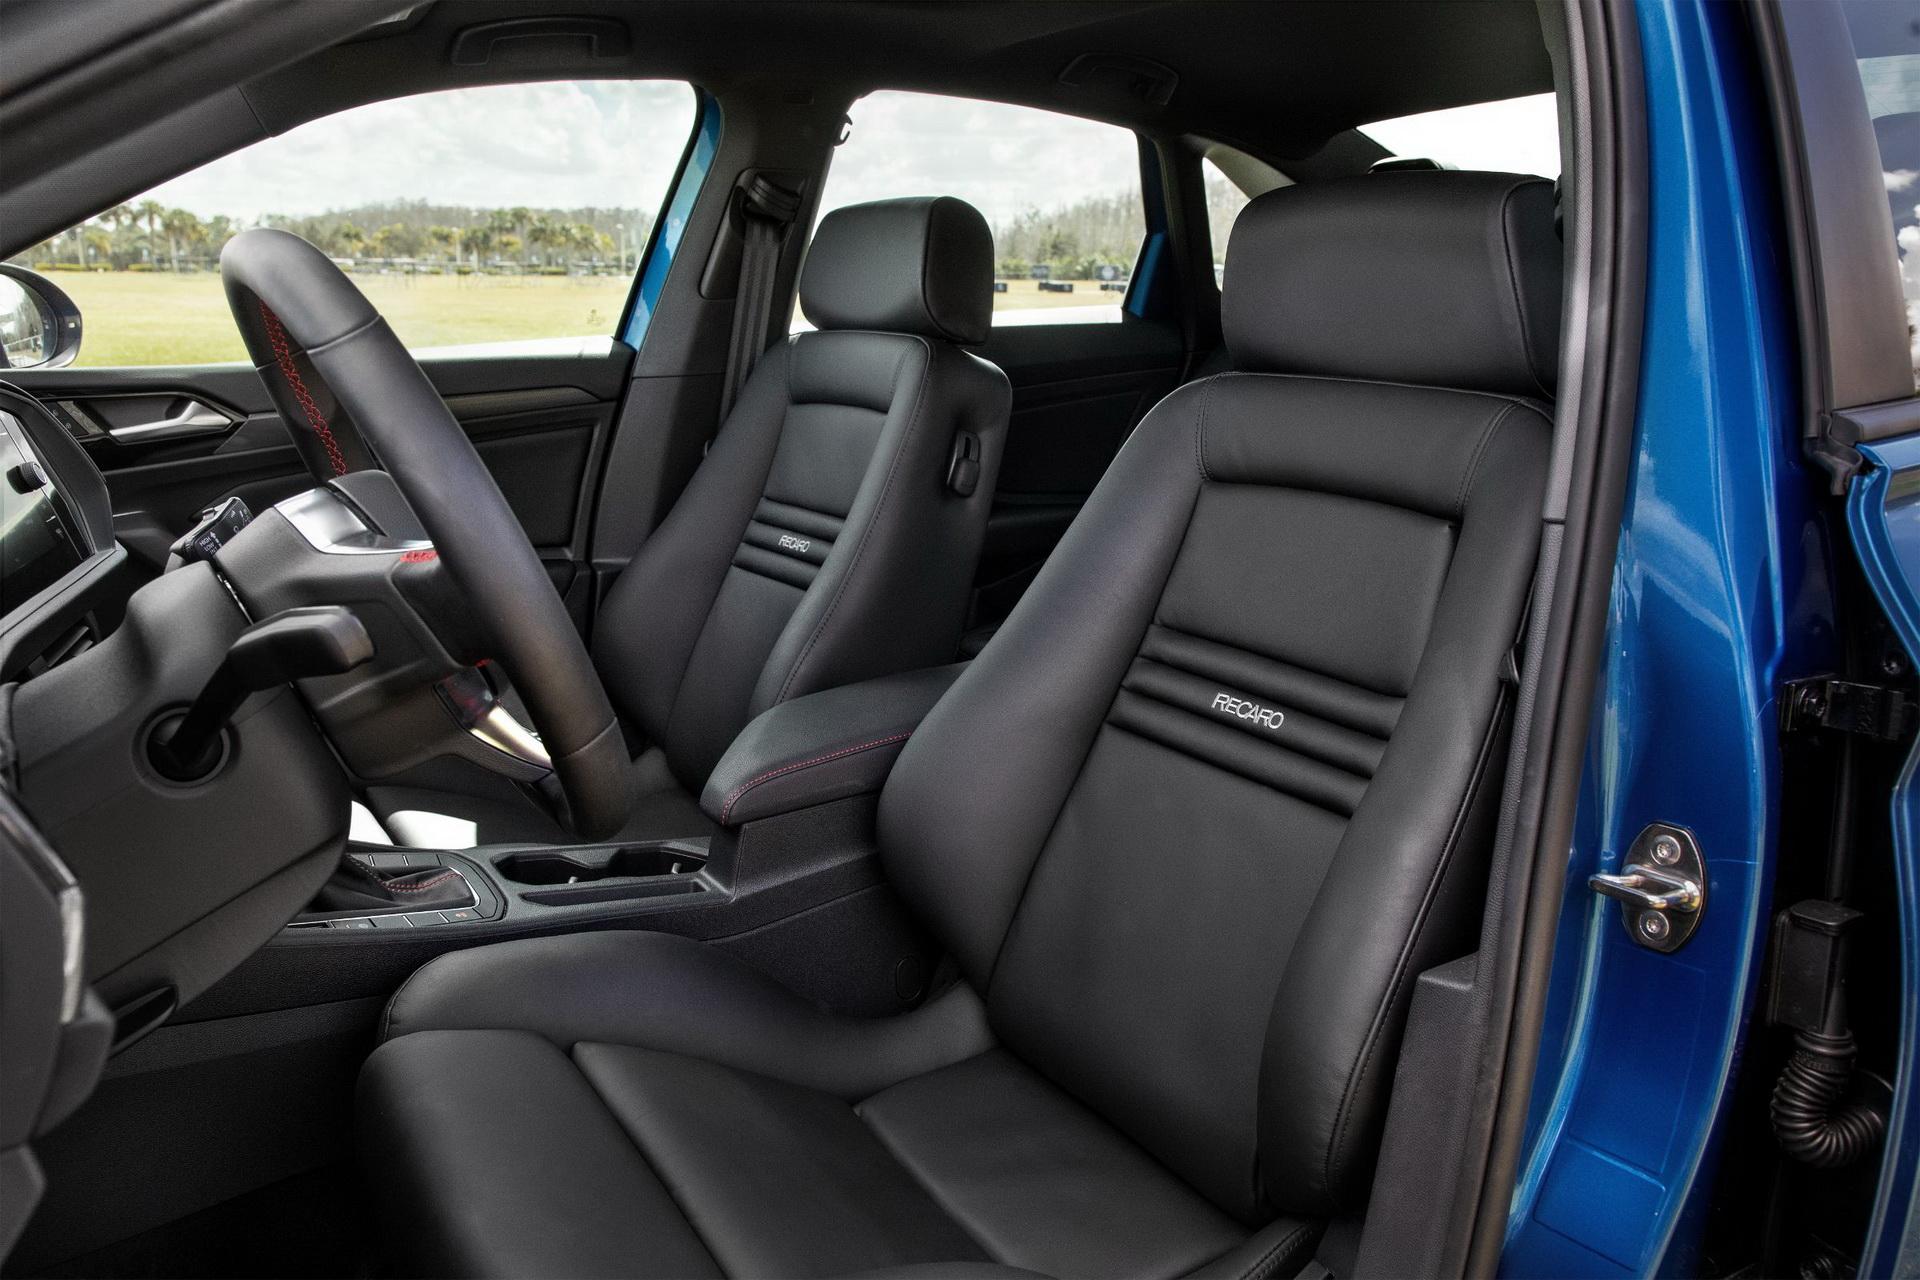 Volkswagen готовит спецсерию популярных моделей – Jetta уже готова 4